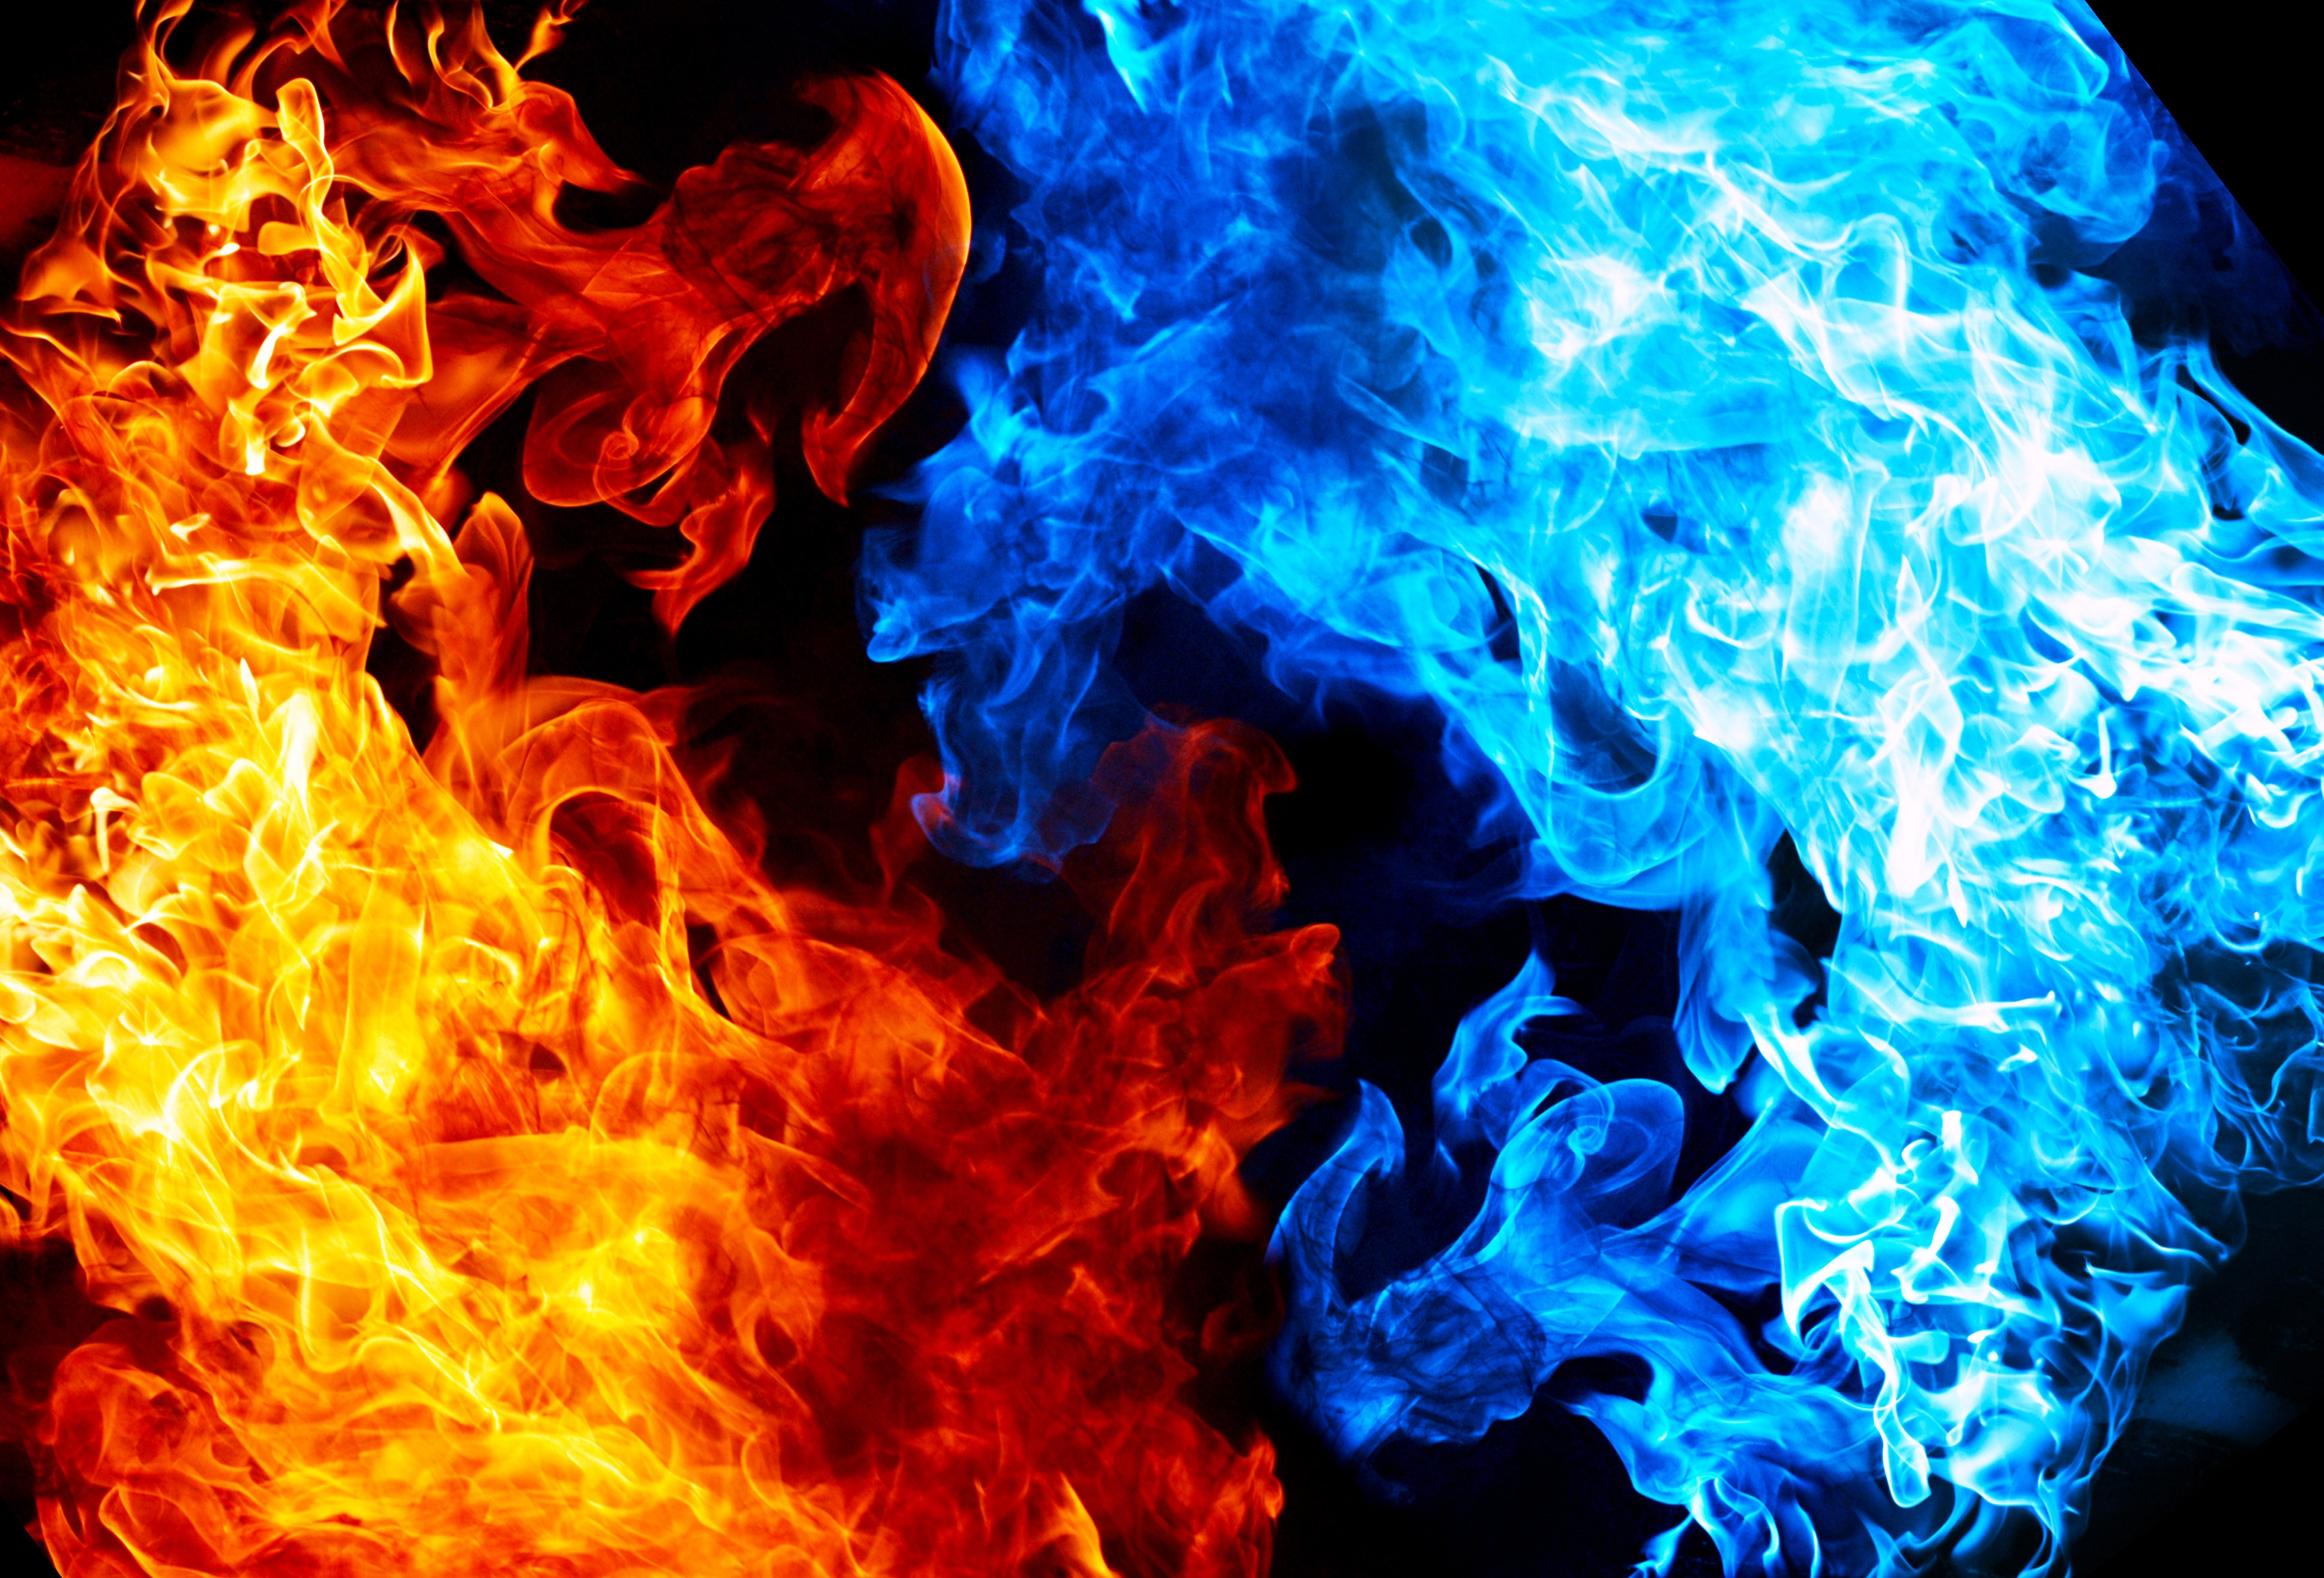 Nethereal Inferno